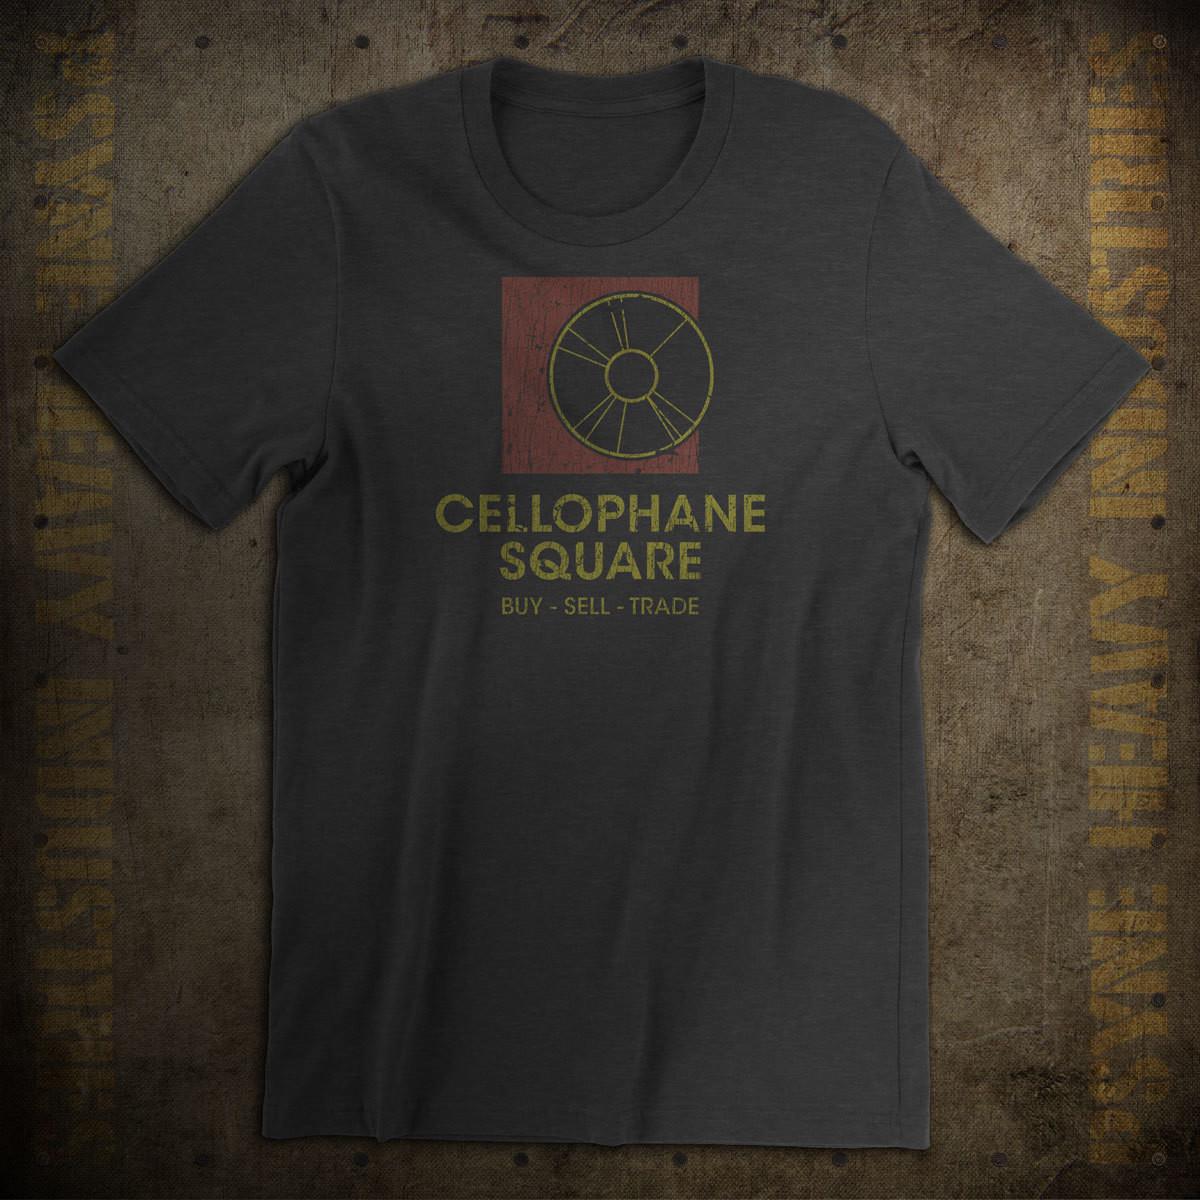 Cellophane Square Seattle Record Store Vintage T-Shirt